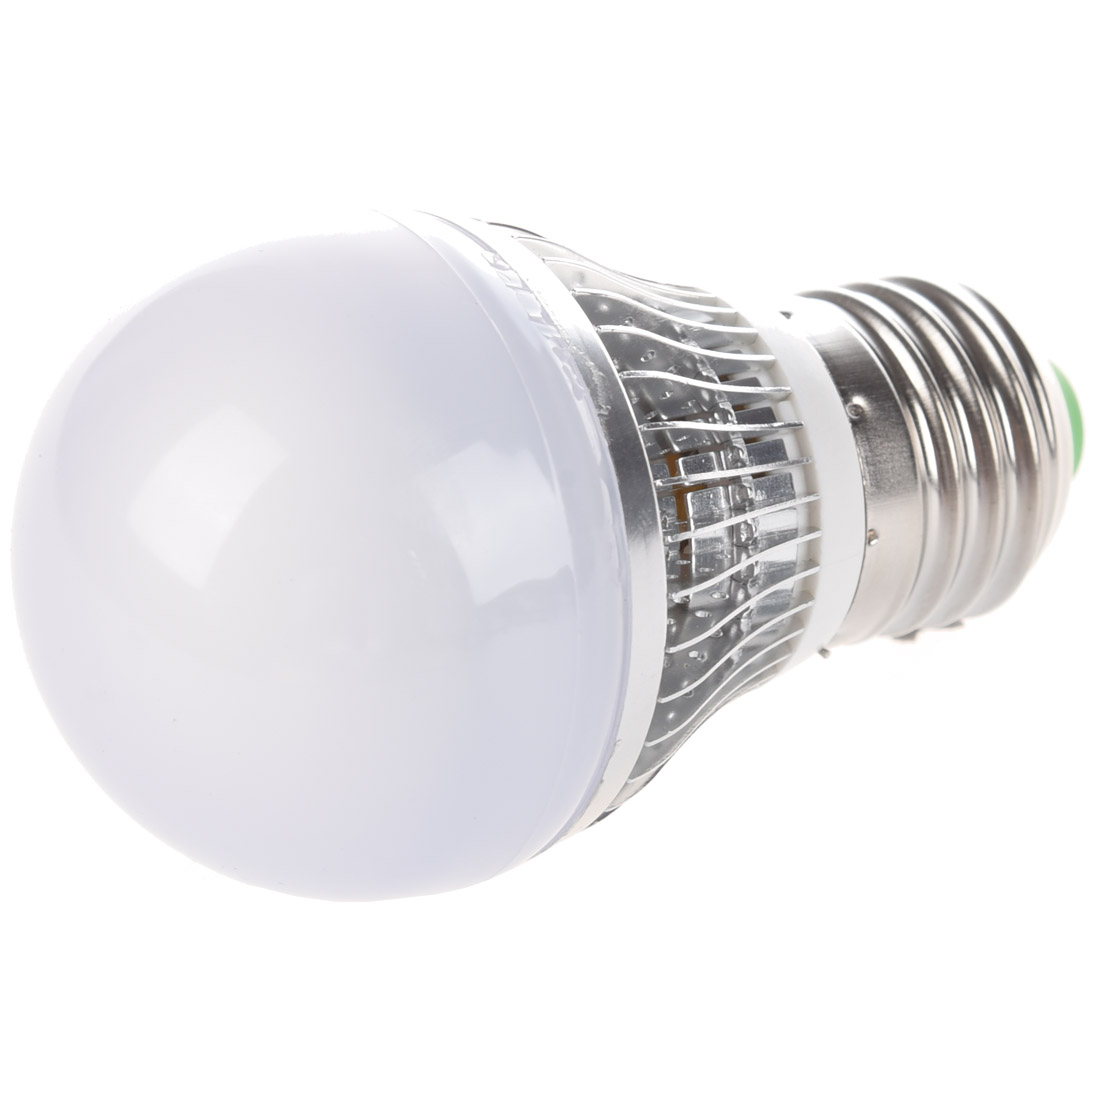 Led Bulbs & Tubes Light Bulbs Adroit 3w E27 Led Bubble Ball Bulb Globe Lamp Smd 5730 High Brightness Energy Saving Light 85-265v 6000-6500k White Selling Well All Over The World